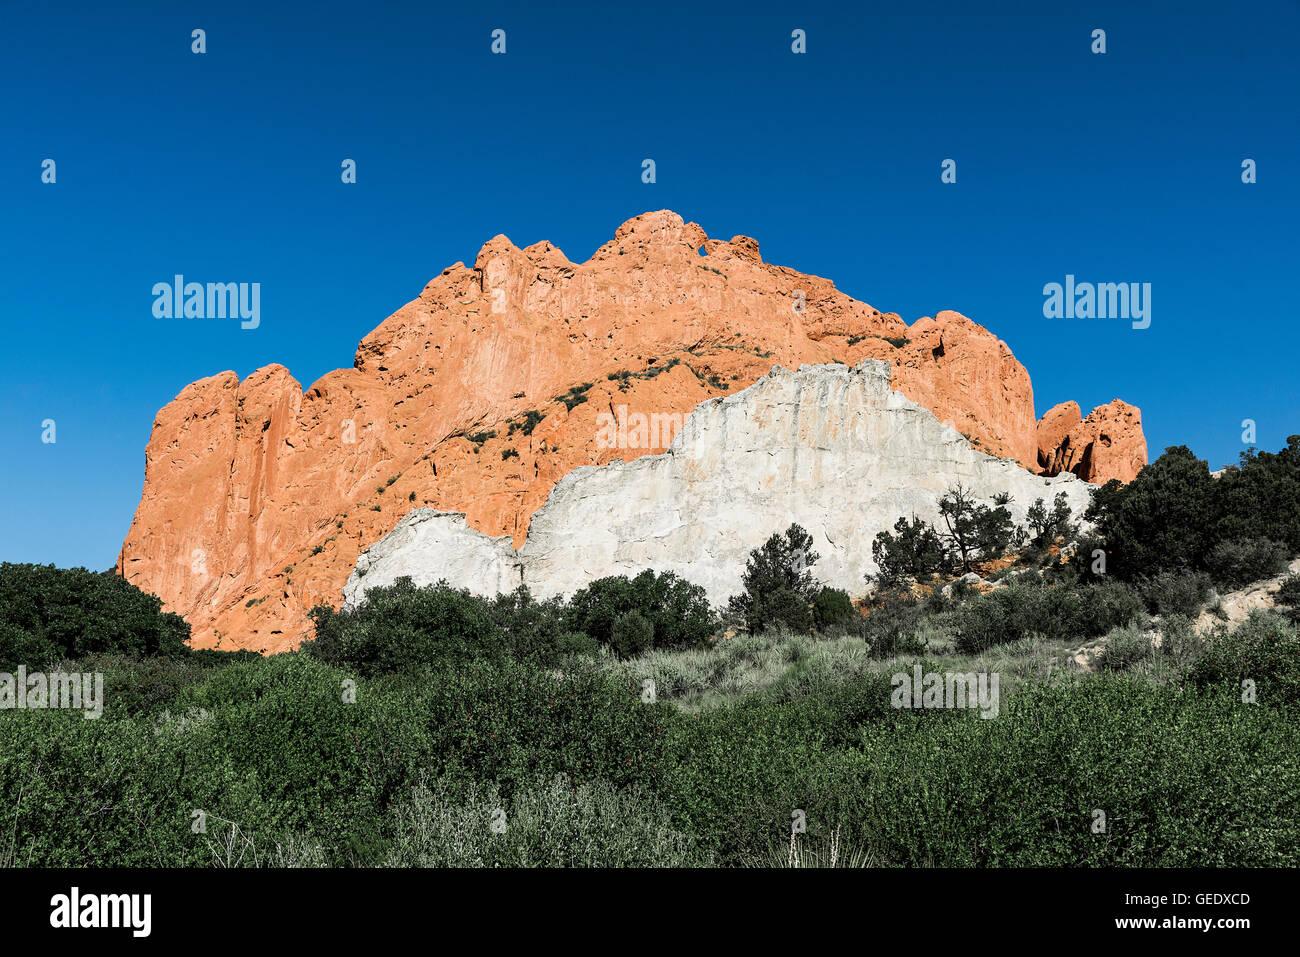 Garden of the Gods Park, Colorado Springs, Colorado, USA. - Stock Image